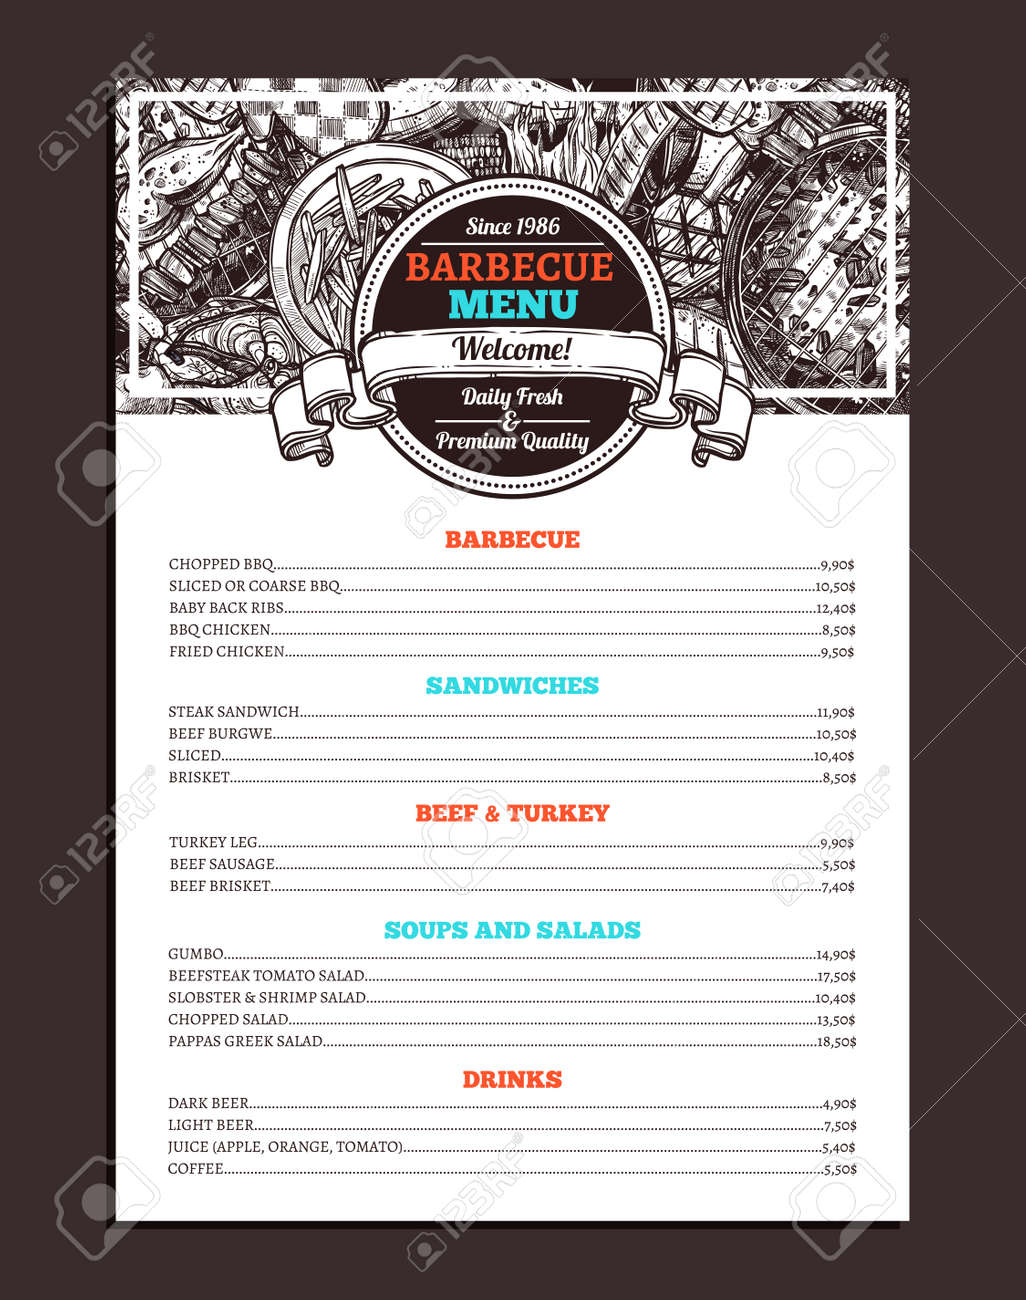 barbecue restaurant menu template design of bbq brochure on